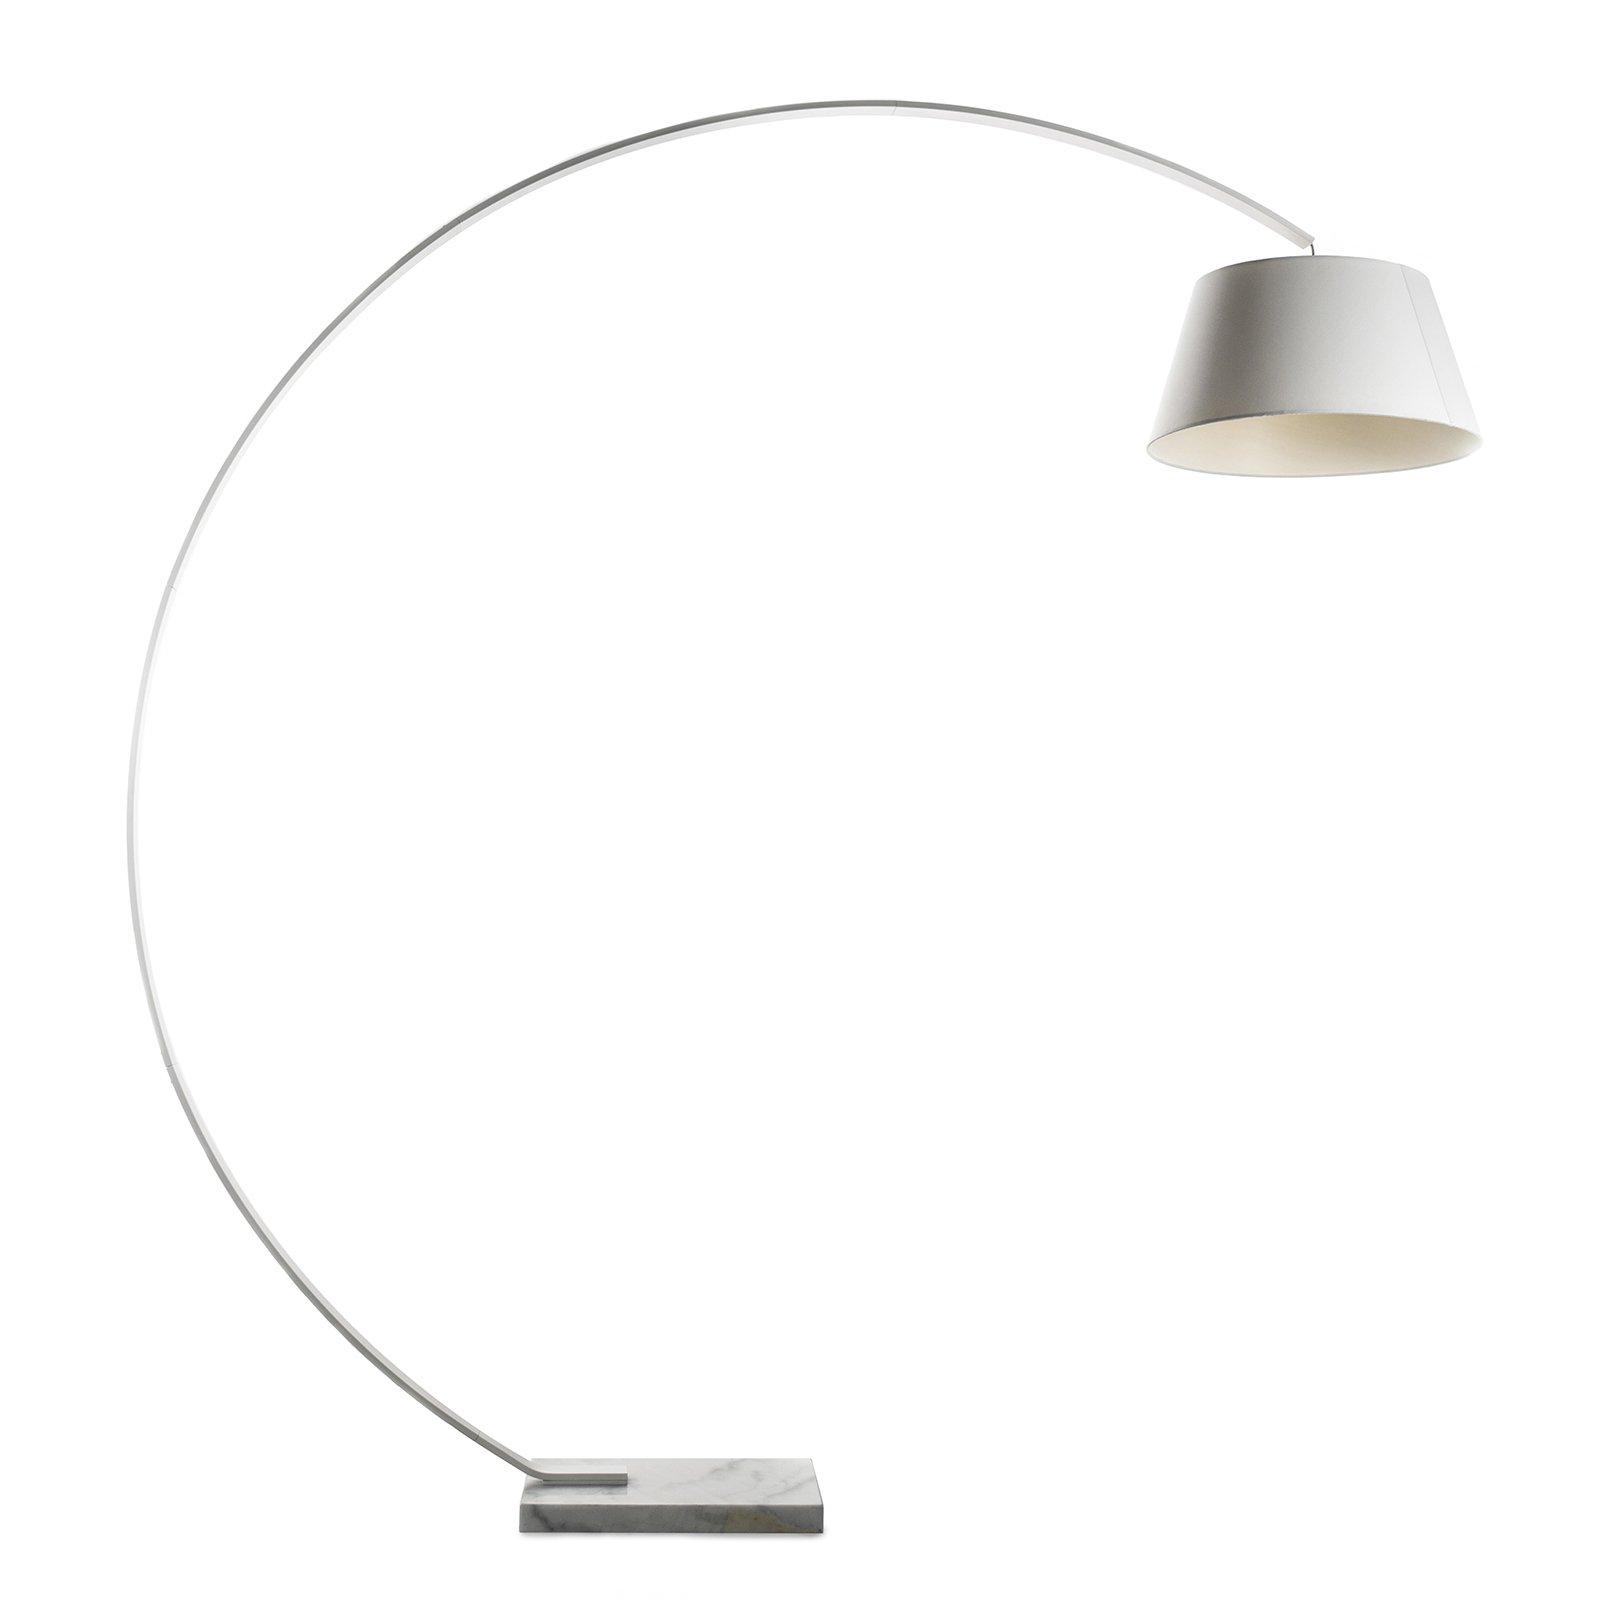 Meelano 108-WHI Floor Lamp, White